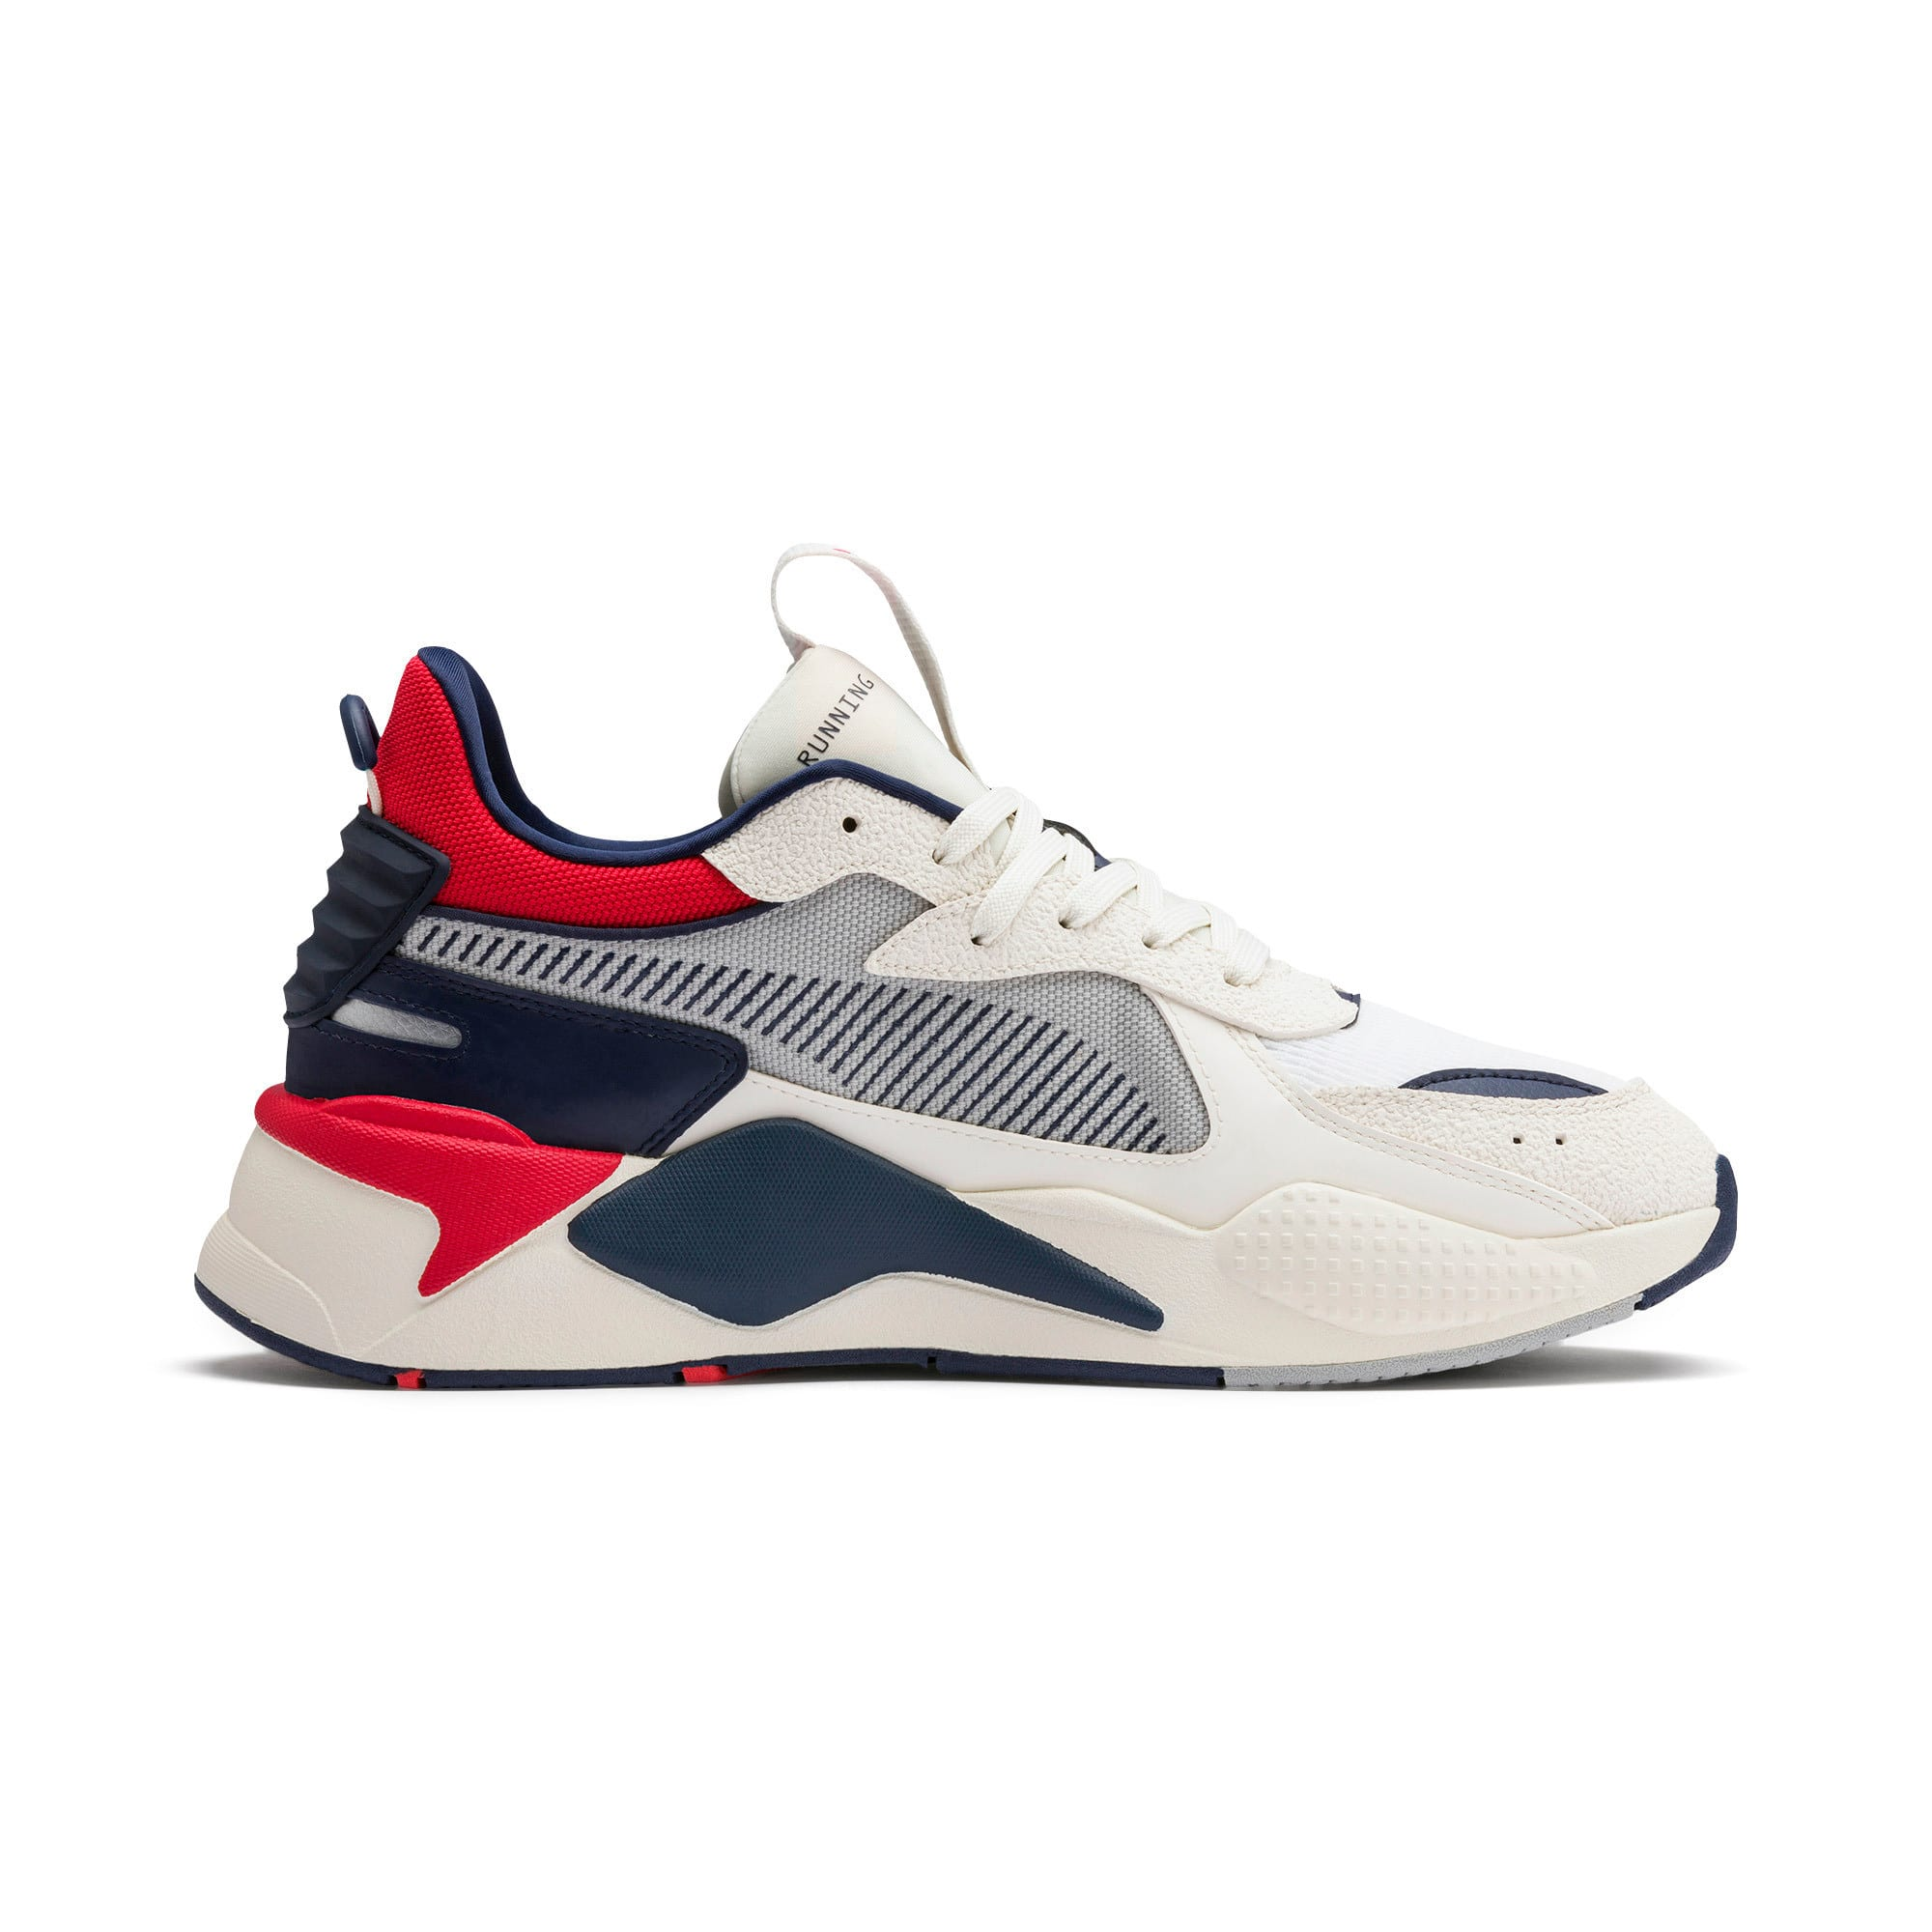 Thumbnail 6 of RS-X Hard Drive Sneakers, Whisper White-Peacoat, medium